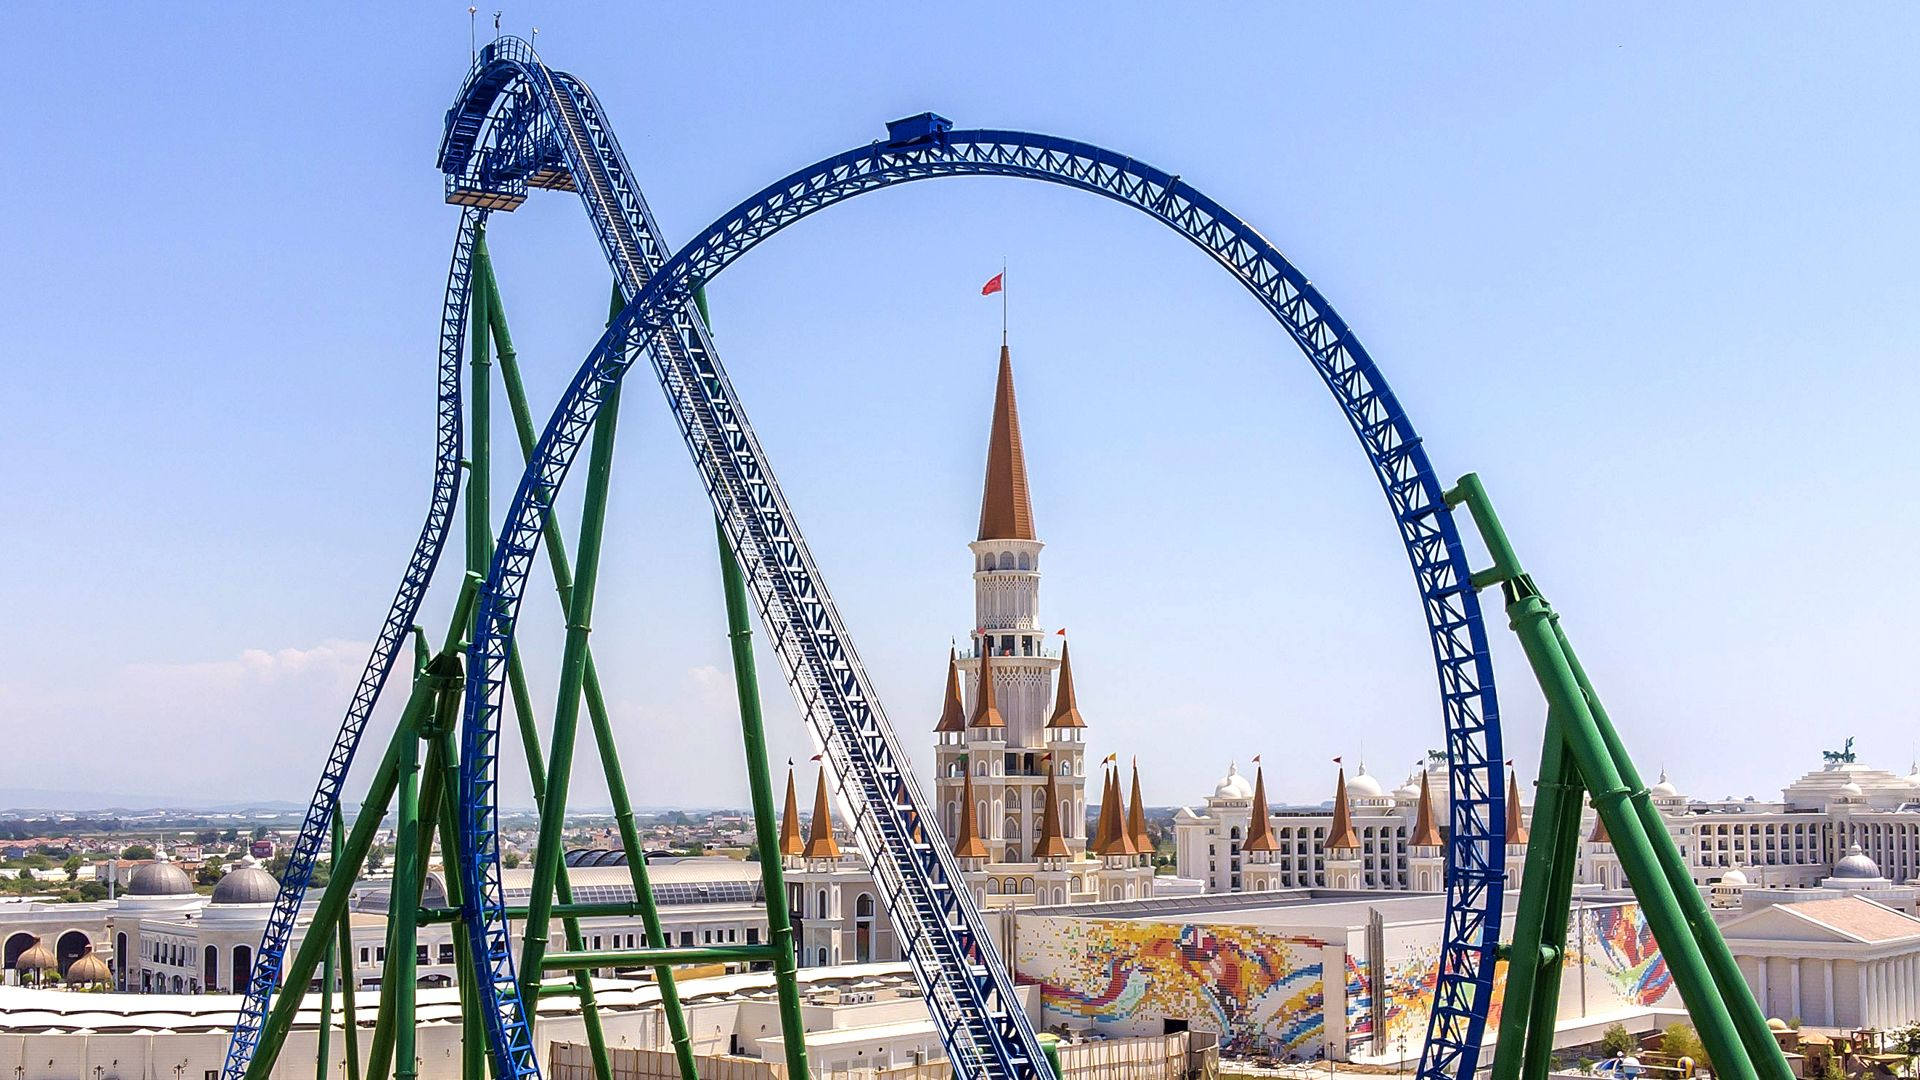 hyper-coaster.jpg